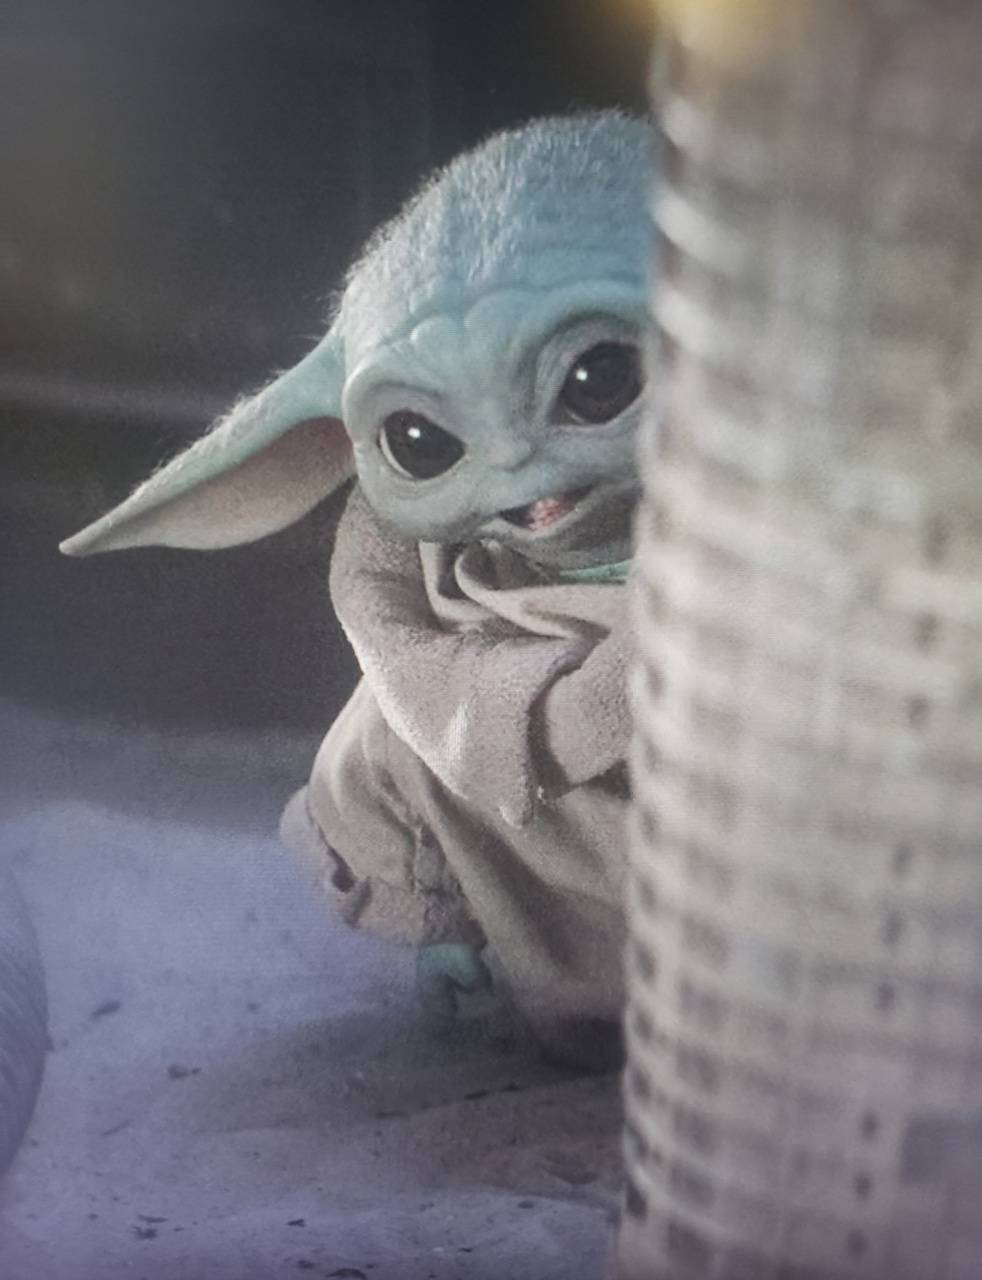 Baby Yoda Wallpaper Android